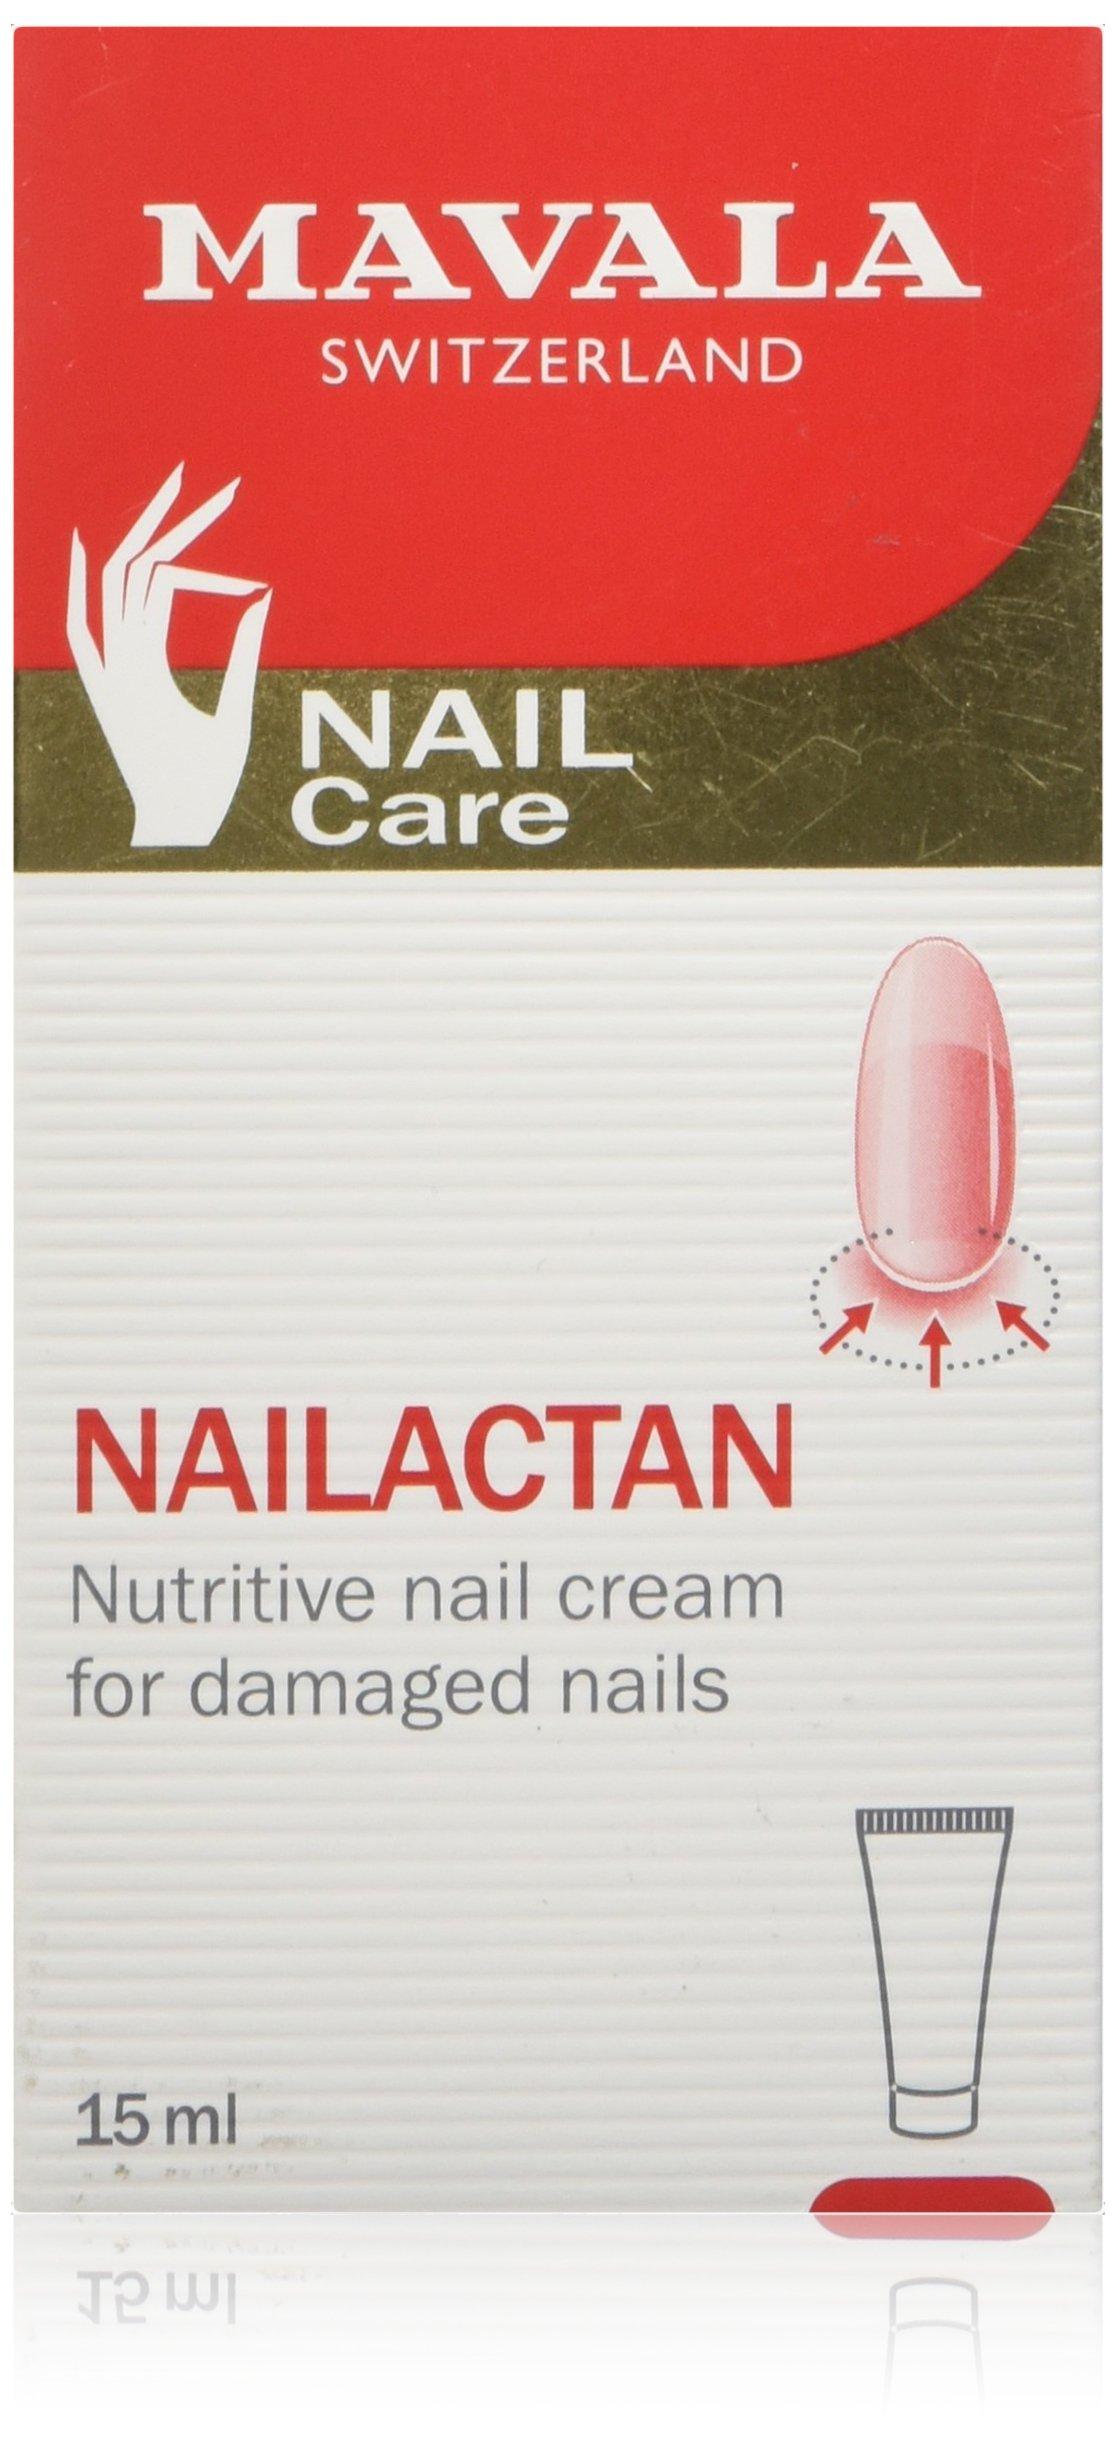 Mavala Nutritive Nail Cream Nailactan for Damaged Nails, 15 ml